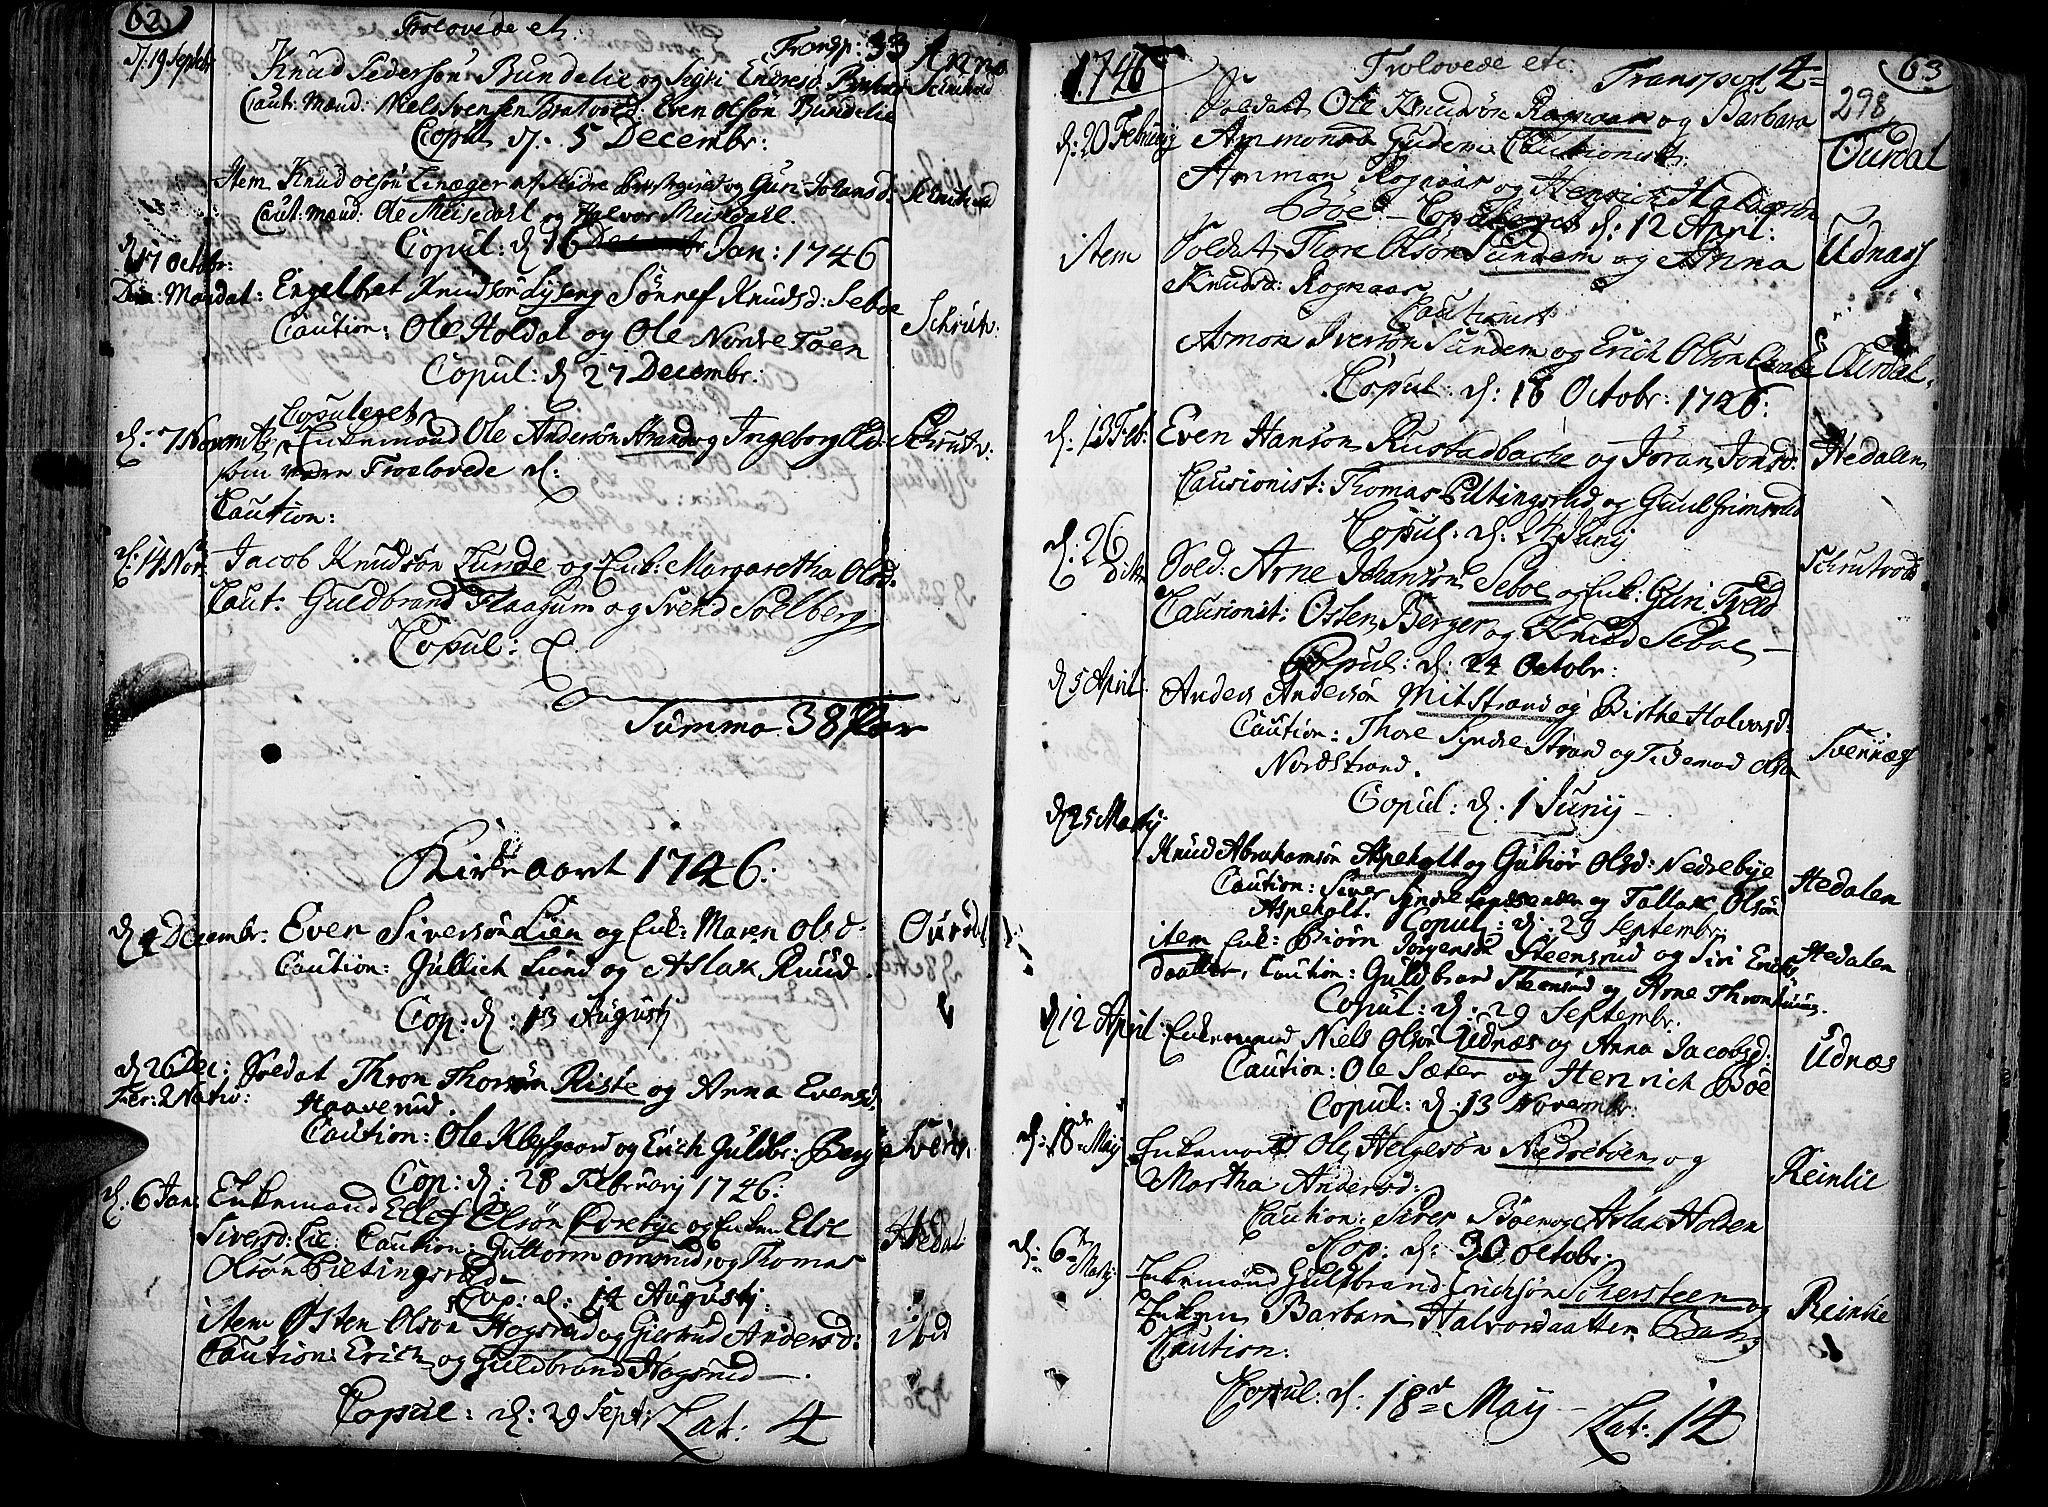 SAH, Aurdal prestekontor, Ministerialbok nr. 4, 1730-1762, s. 62-63